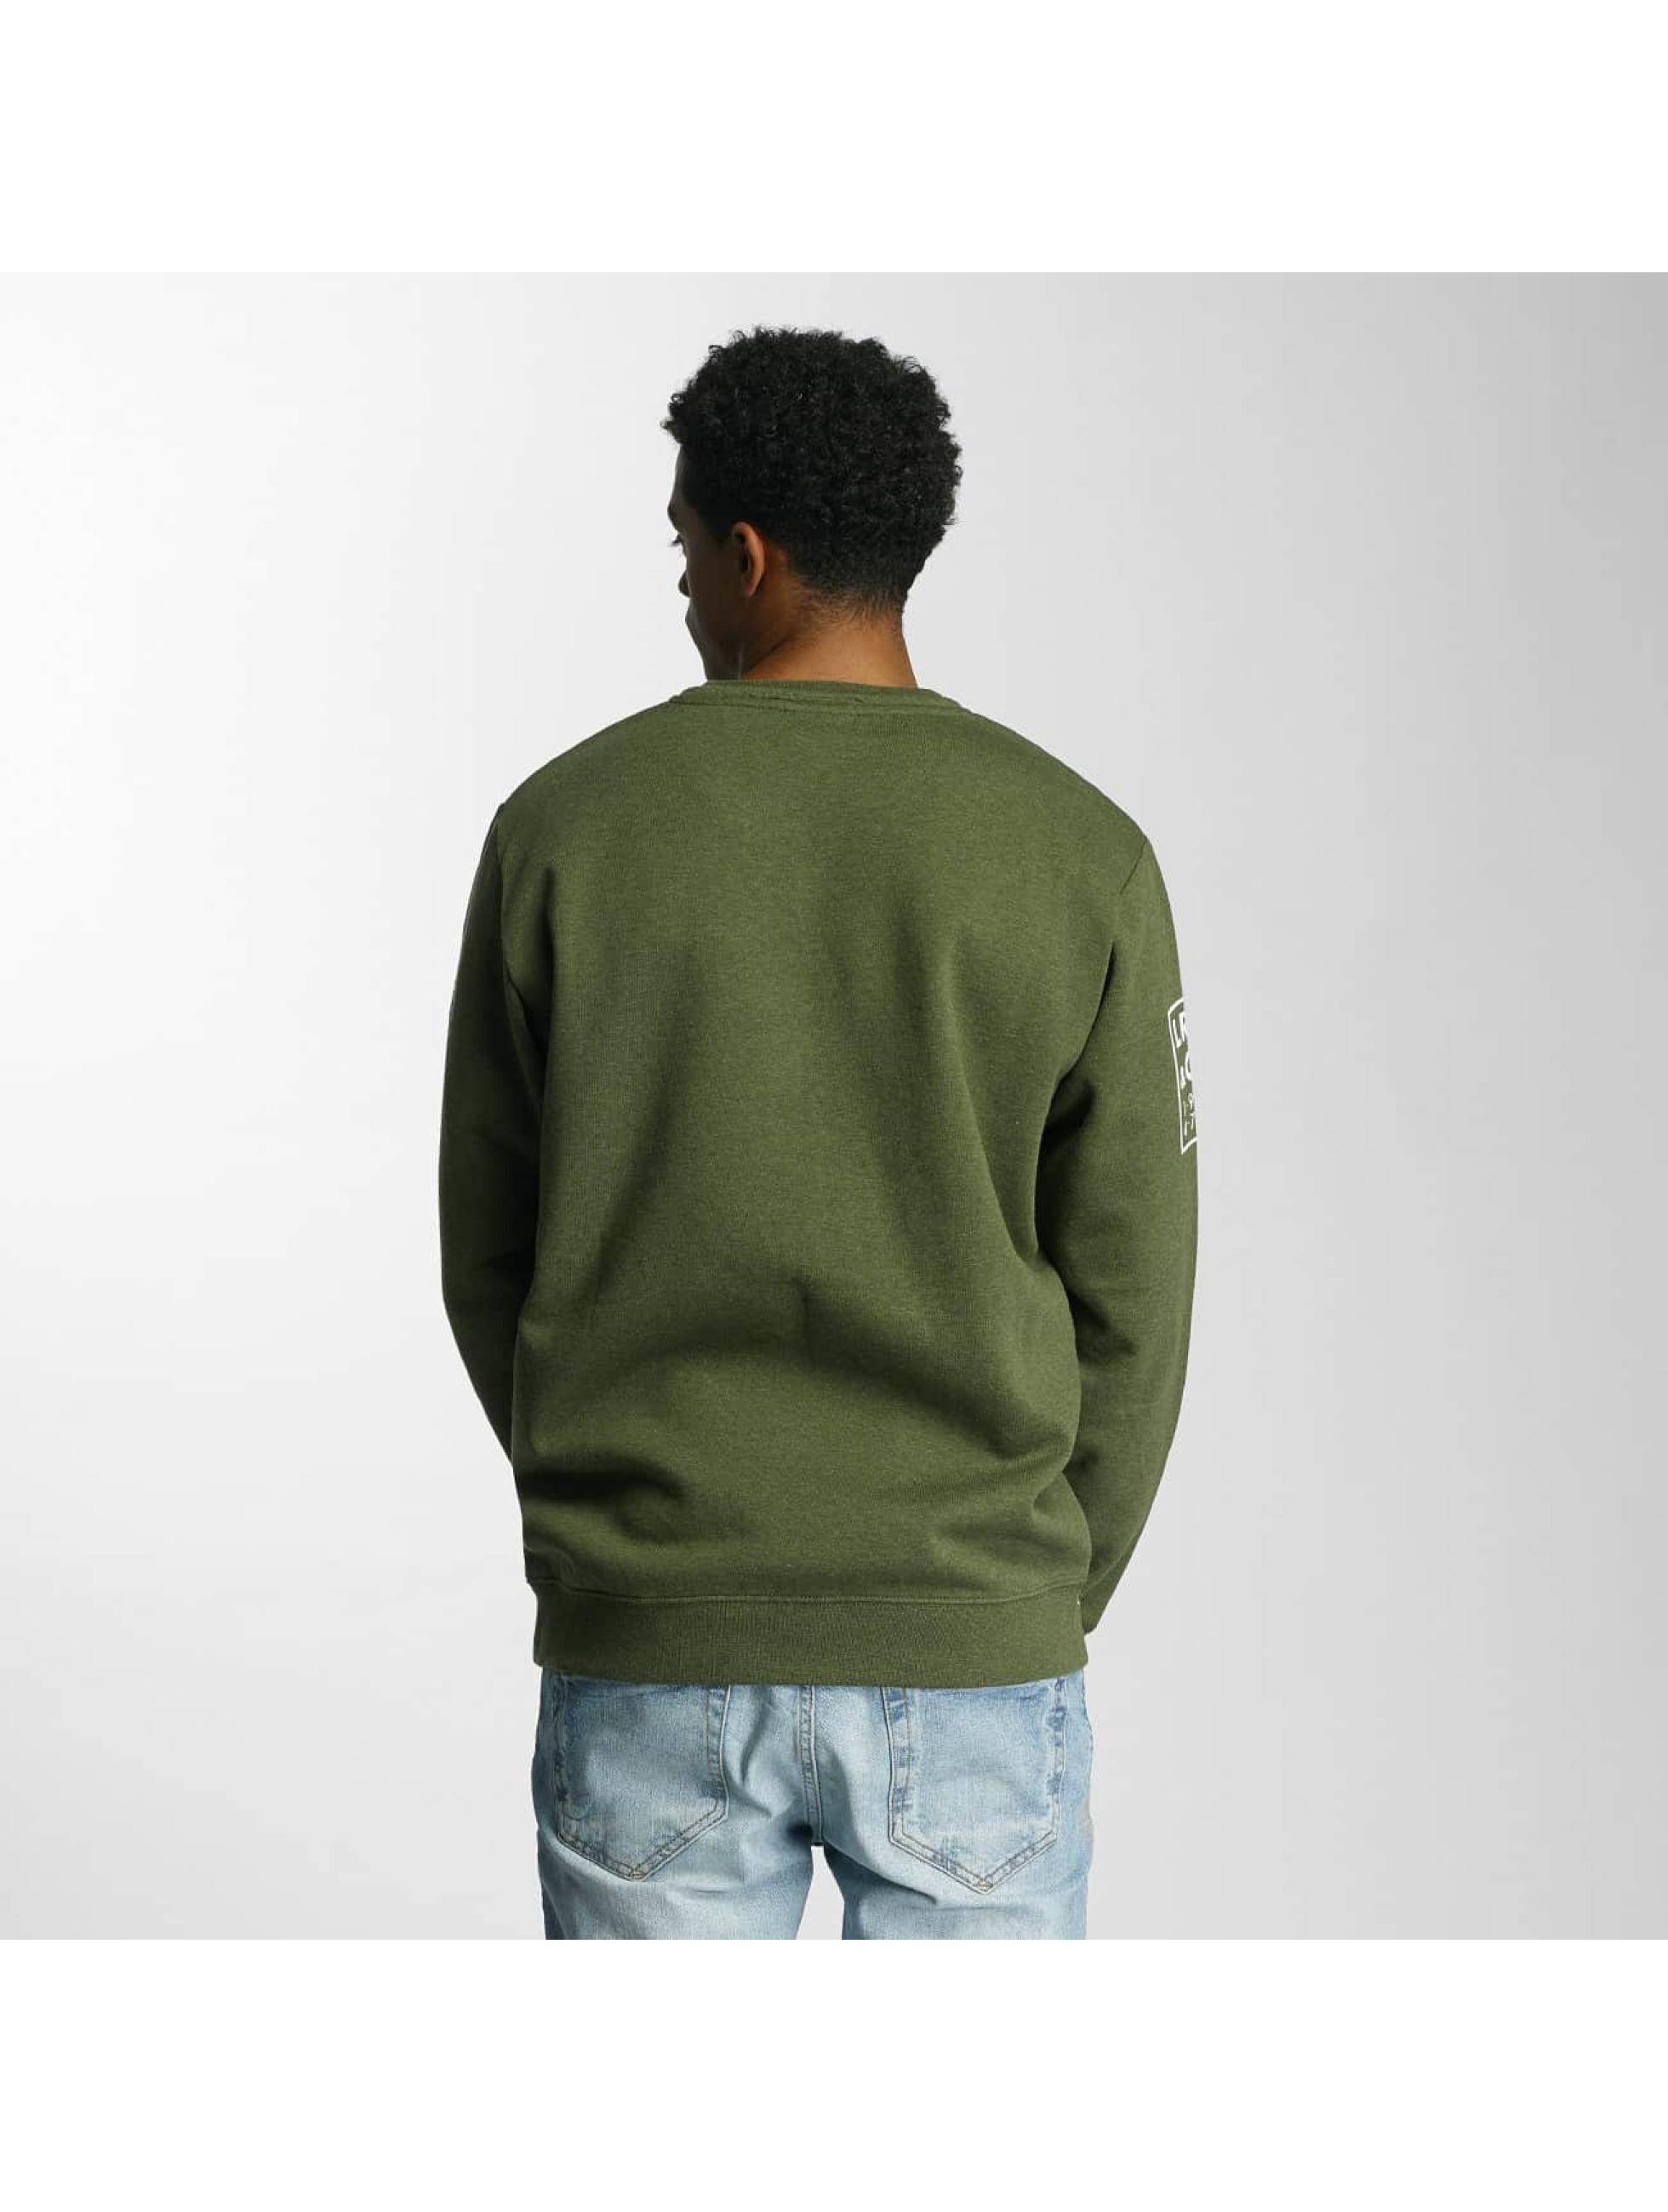 LRG Пуловер Multi Kulture оливковый